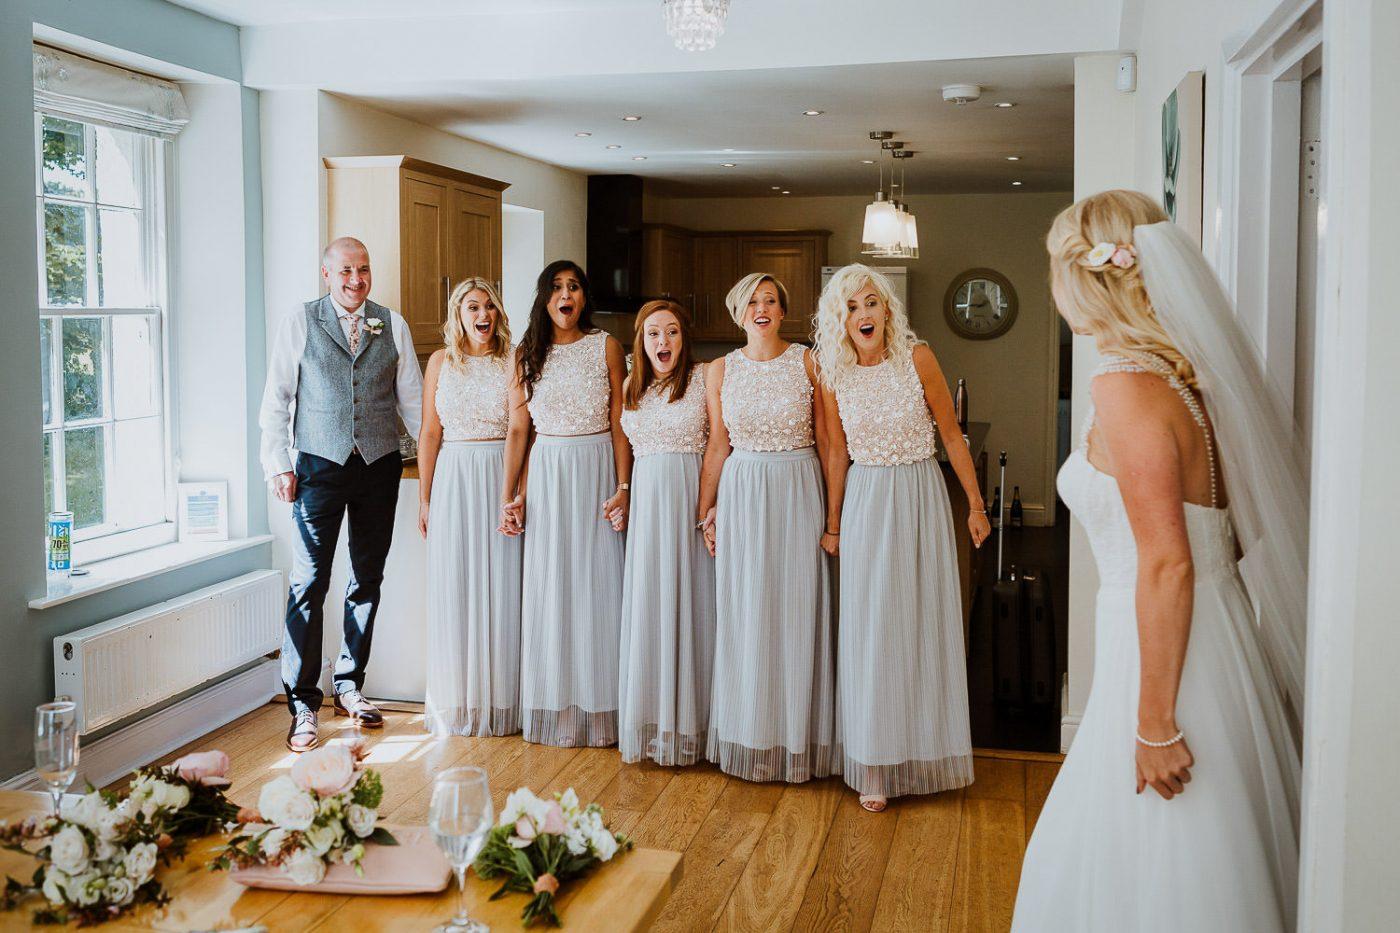 Wedding Photography by Alexa Poppe